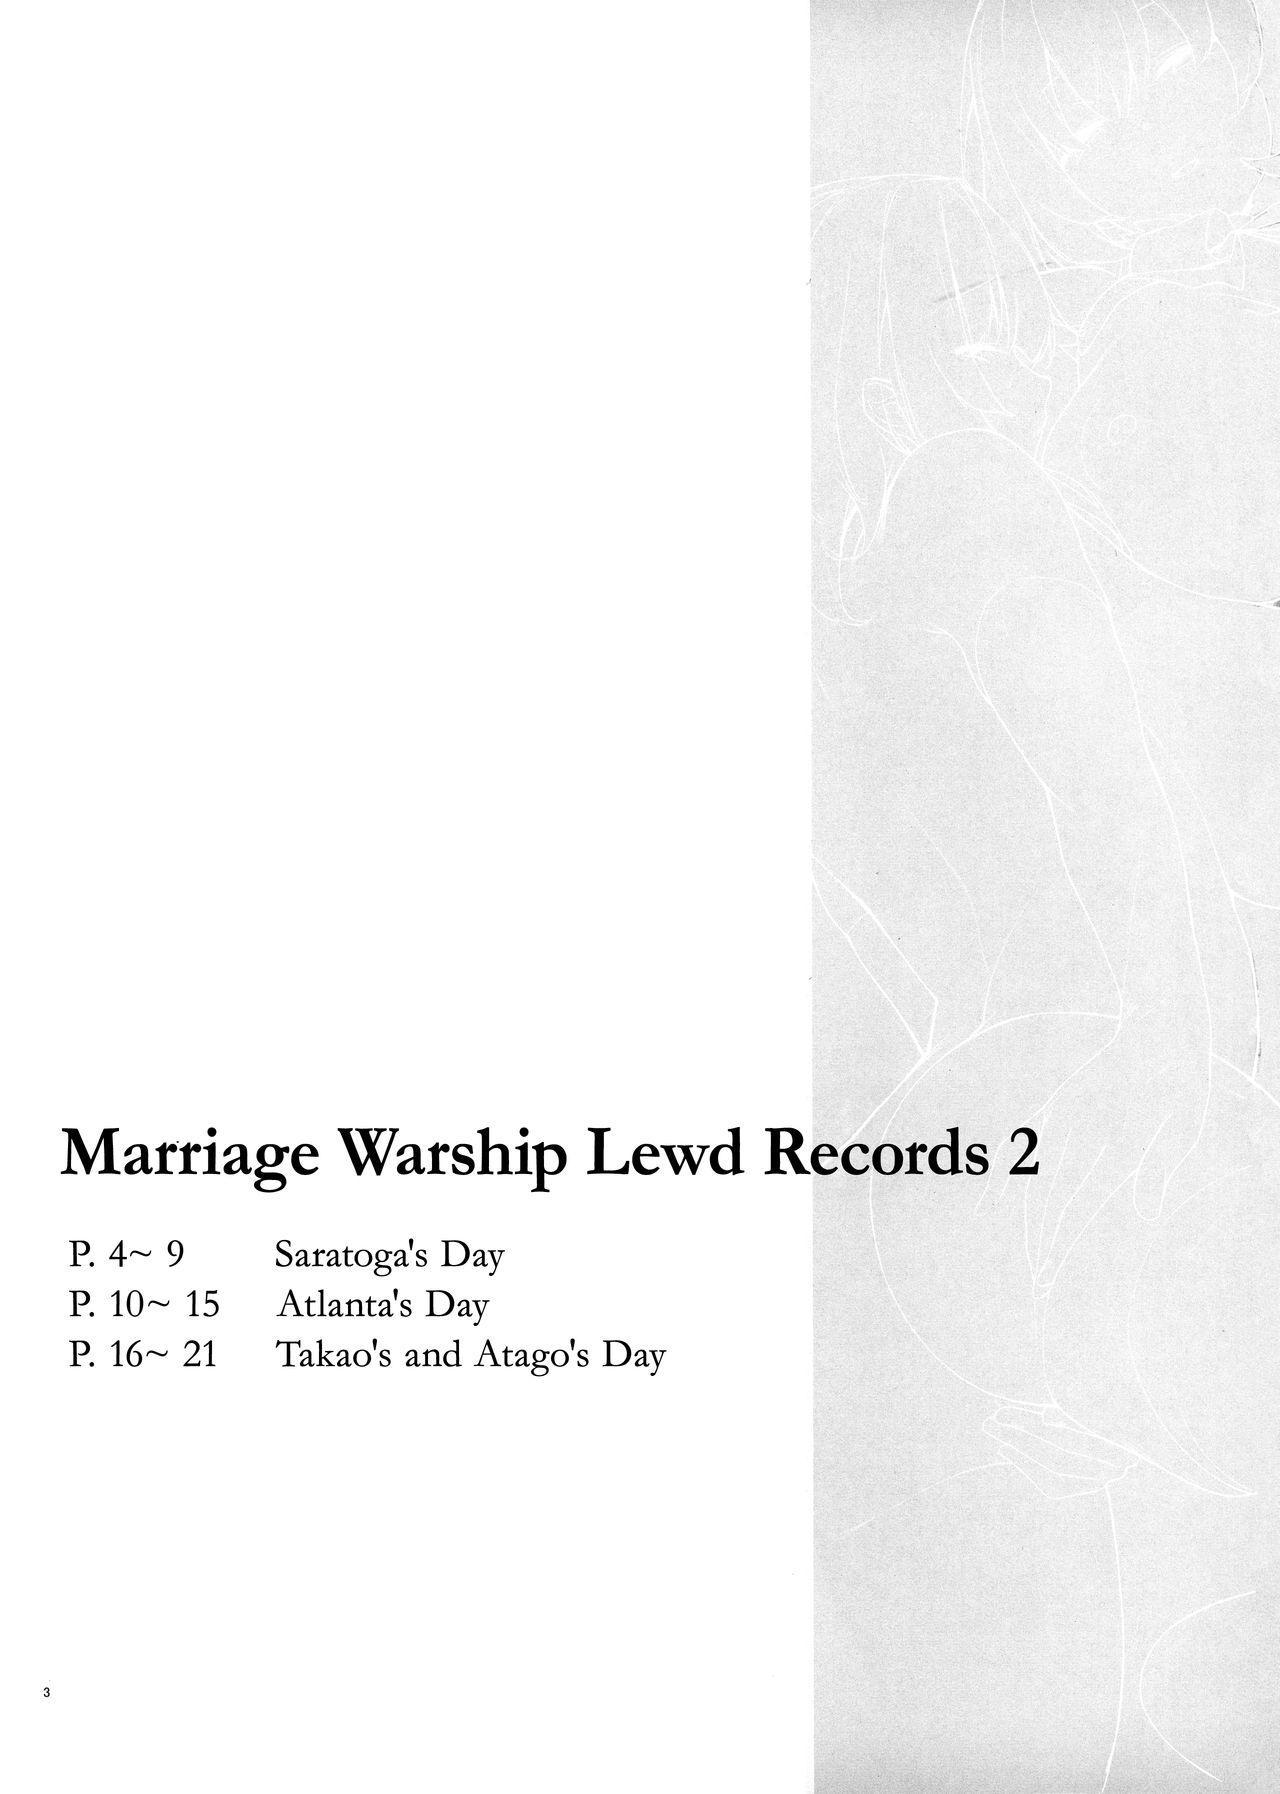 Kekkon Kan Sukebe Roku 2 | Warship Marriage Lewd Records 2 3